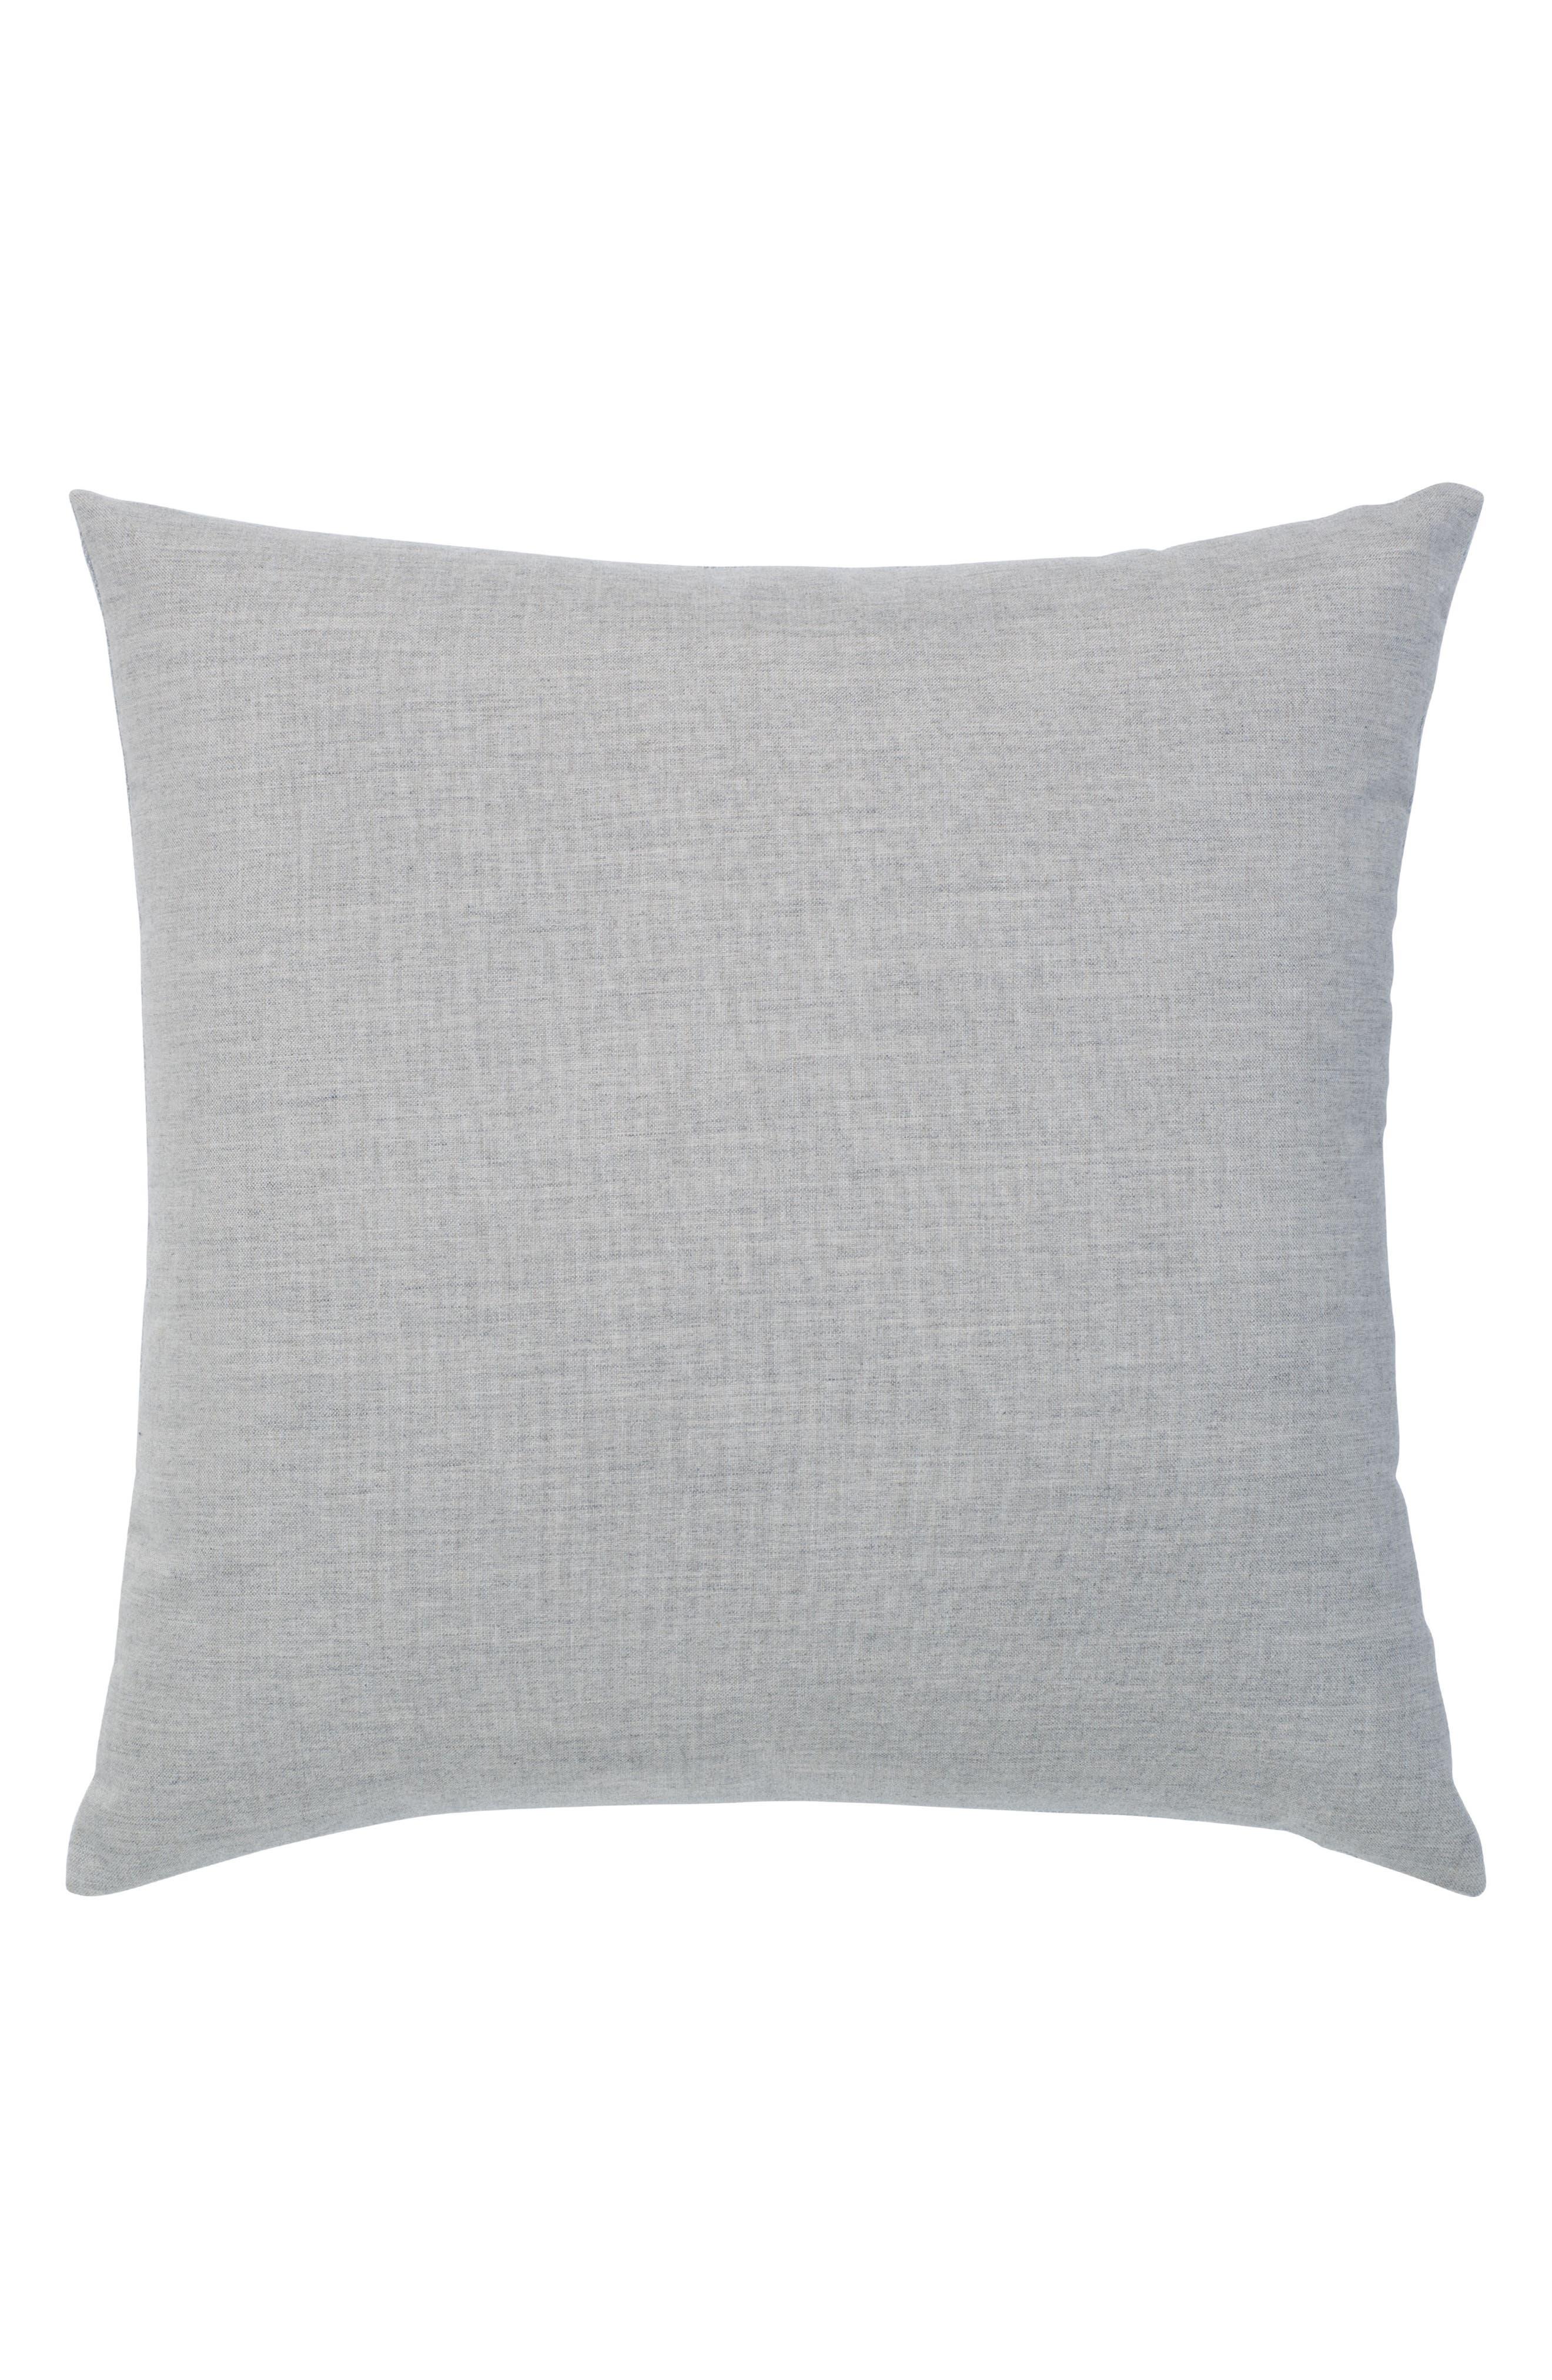 Gladiator Granite Indoor/Outdoor Accent Pillow,                             Alternate thumbnail 2, color,                             020